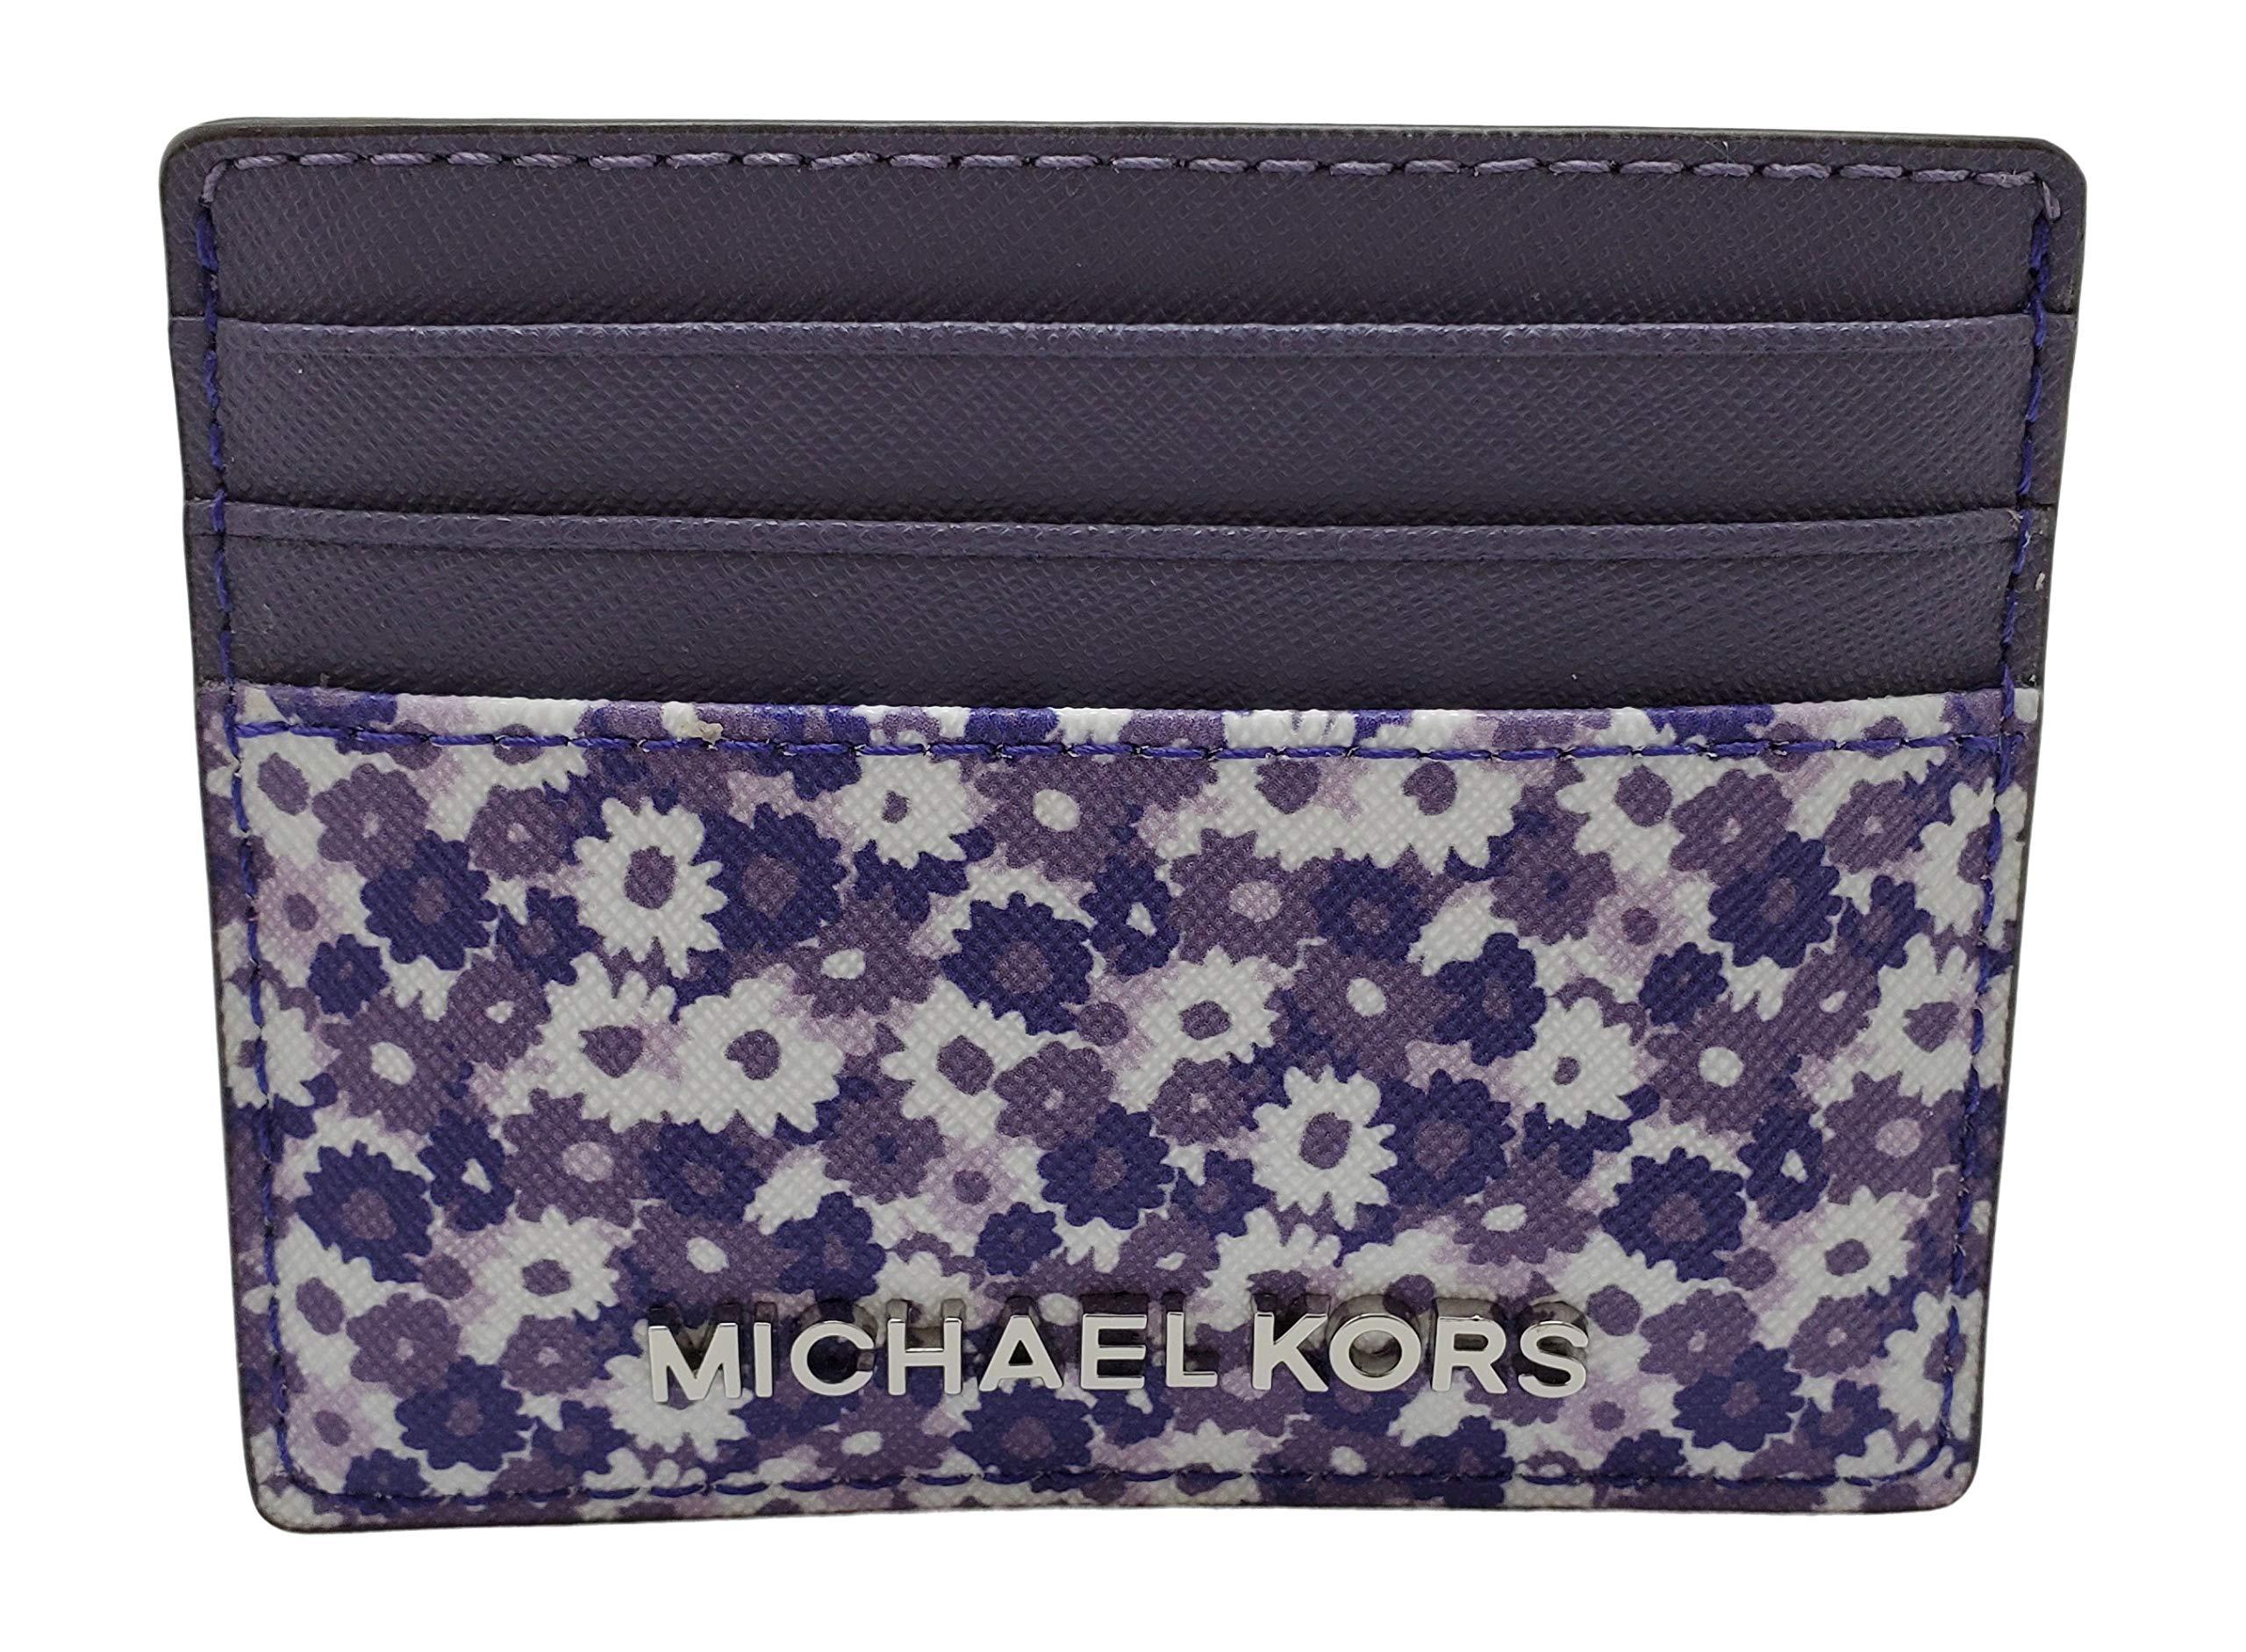 Michael Kors Jet Set Travel Saffiano Leather Credit Card Case Amethyst by Michael Kors